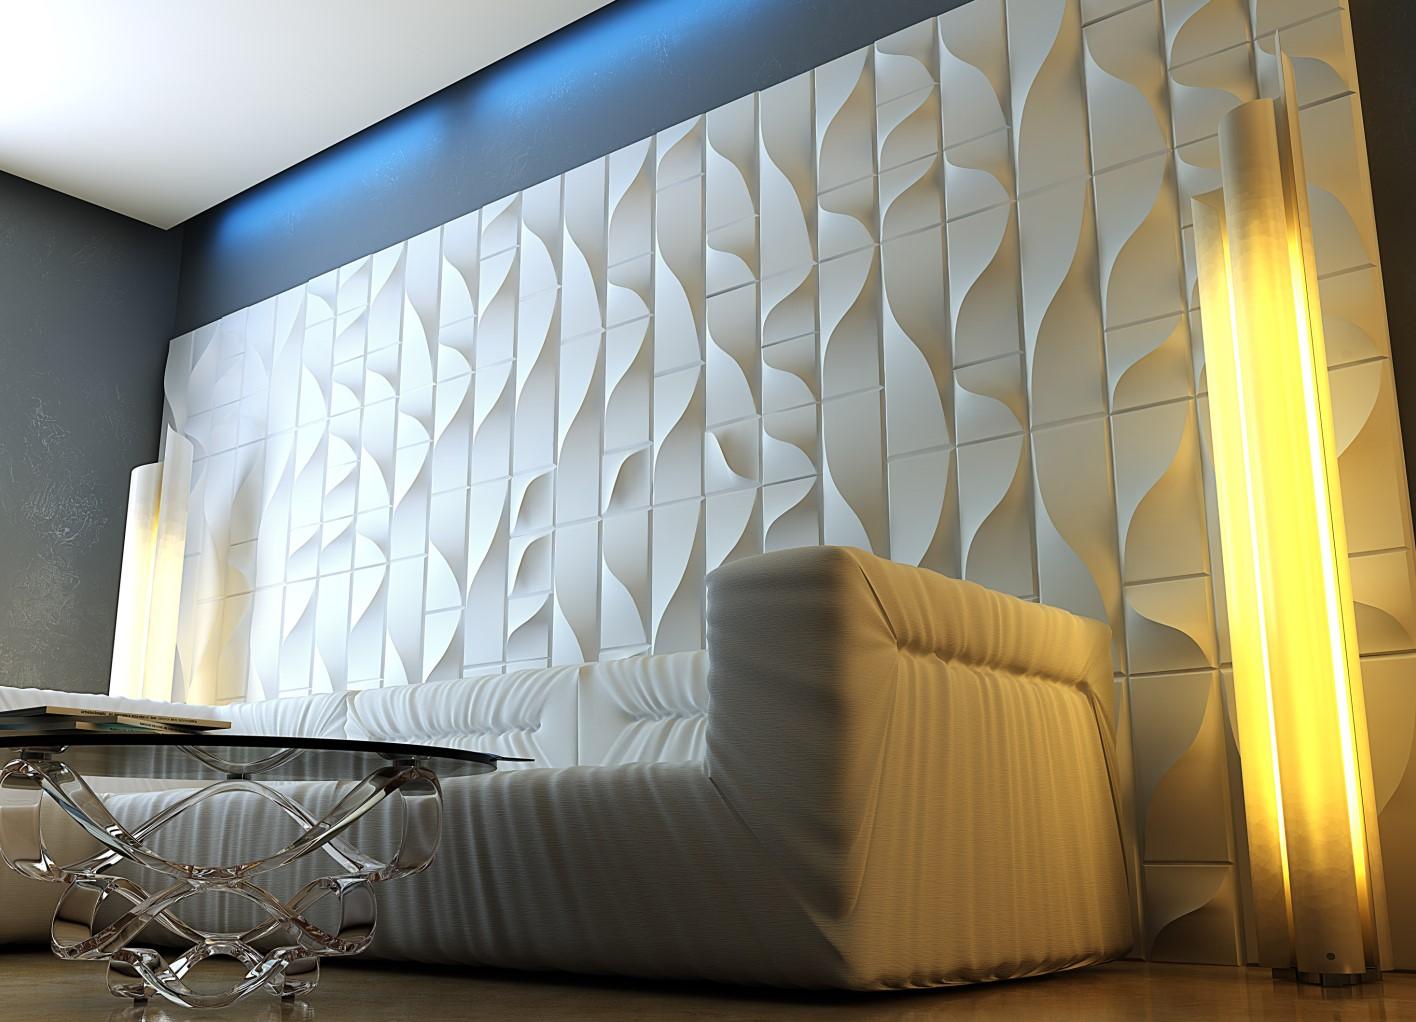 Гипсовые панели 3Д декор стен